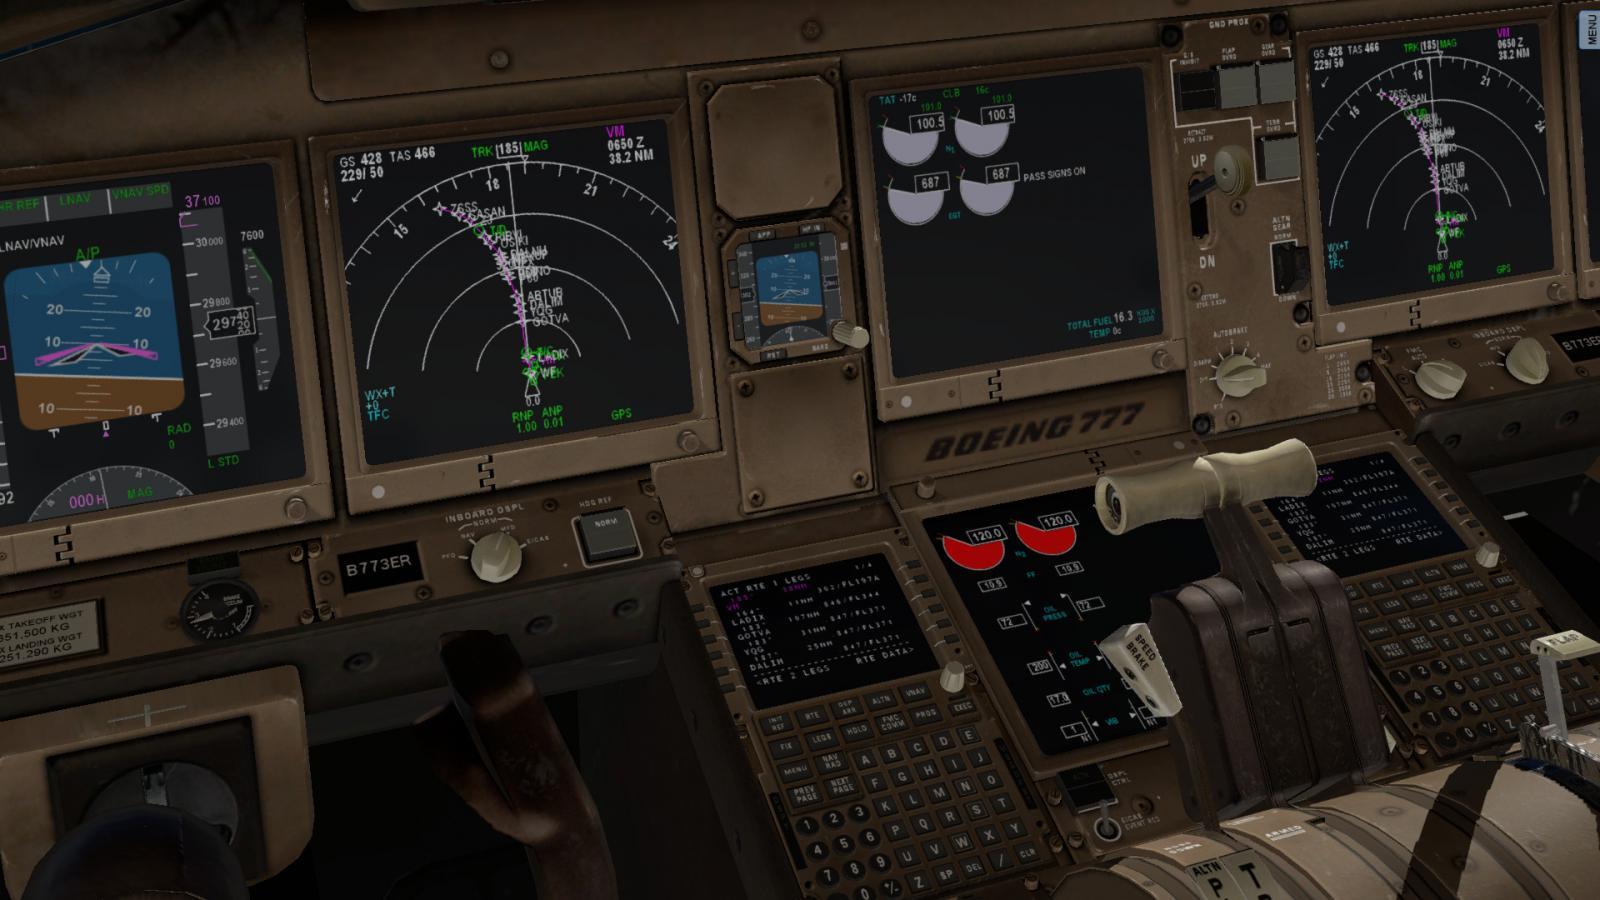 Boeing 777 v1 9 14 - Boeing 777 Worldliner Professional - X